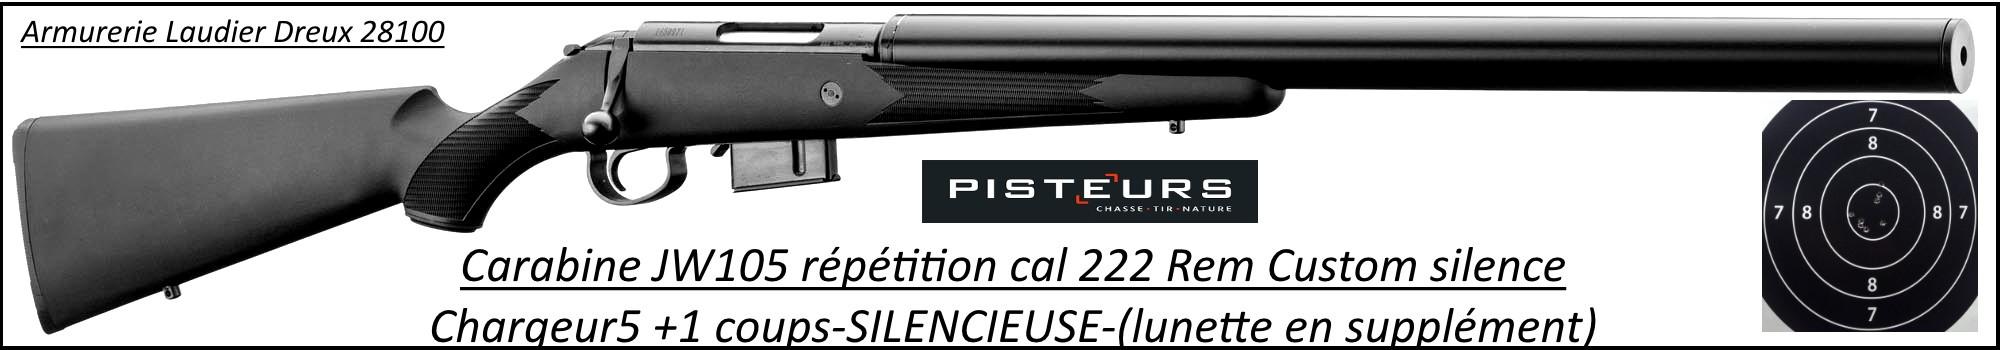 Carabine JW105 CUSTOM SILENCE Calibre 222 Rem-Chargeur 5+1 coups-Promotion-Ref CR706S-ea